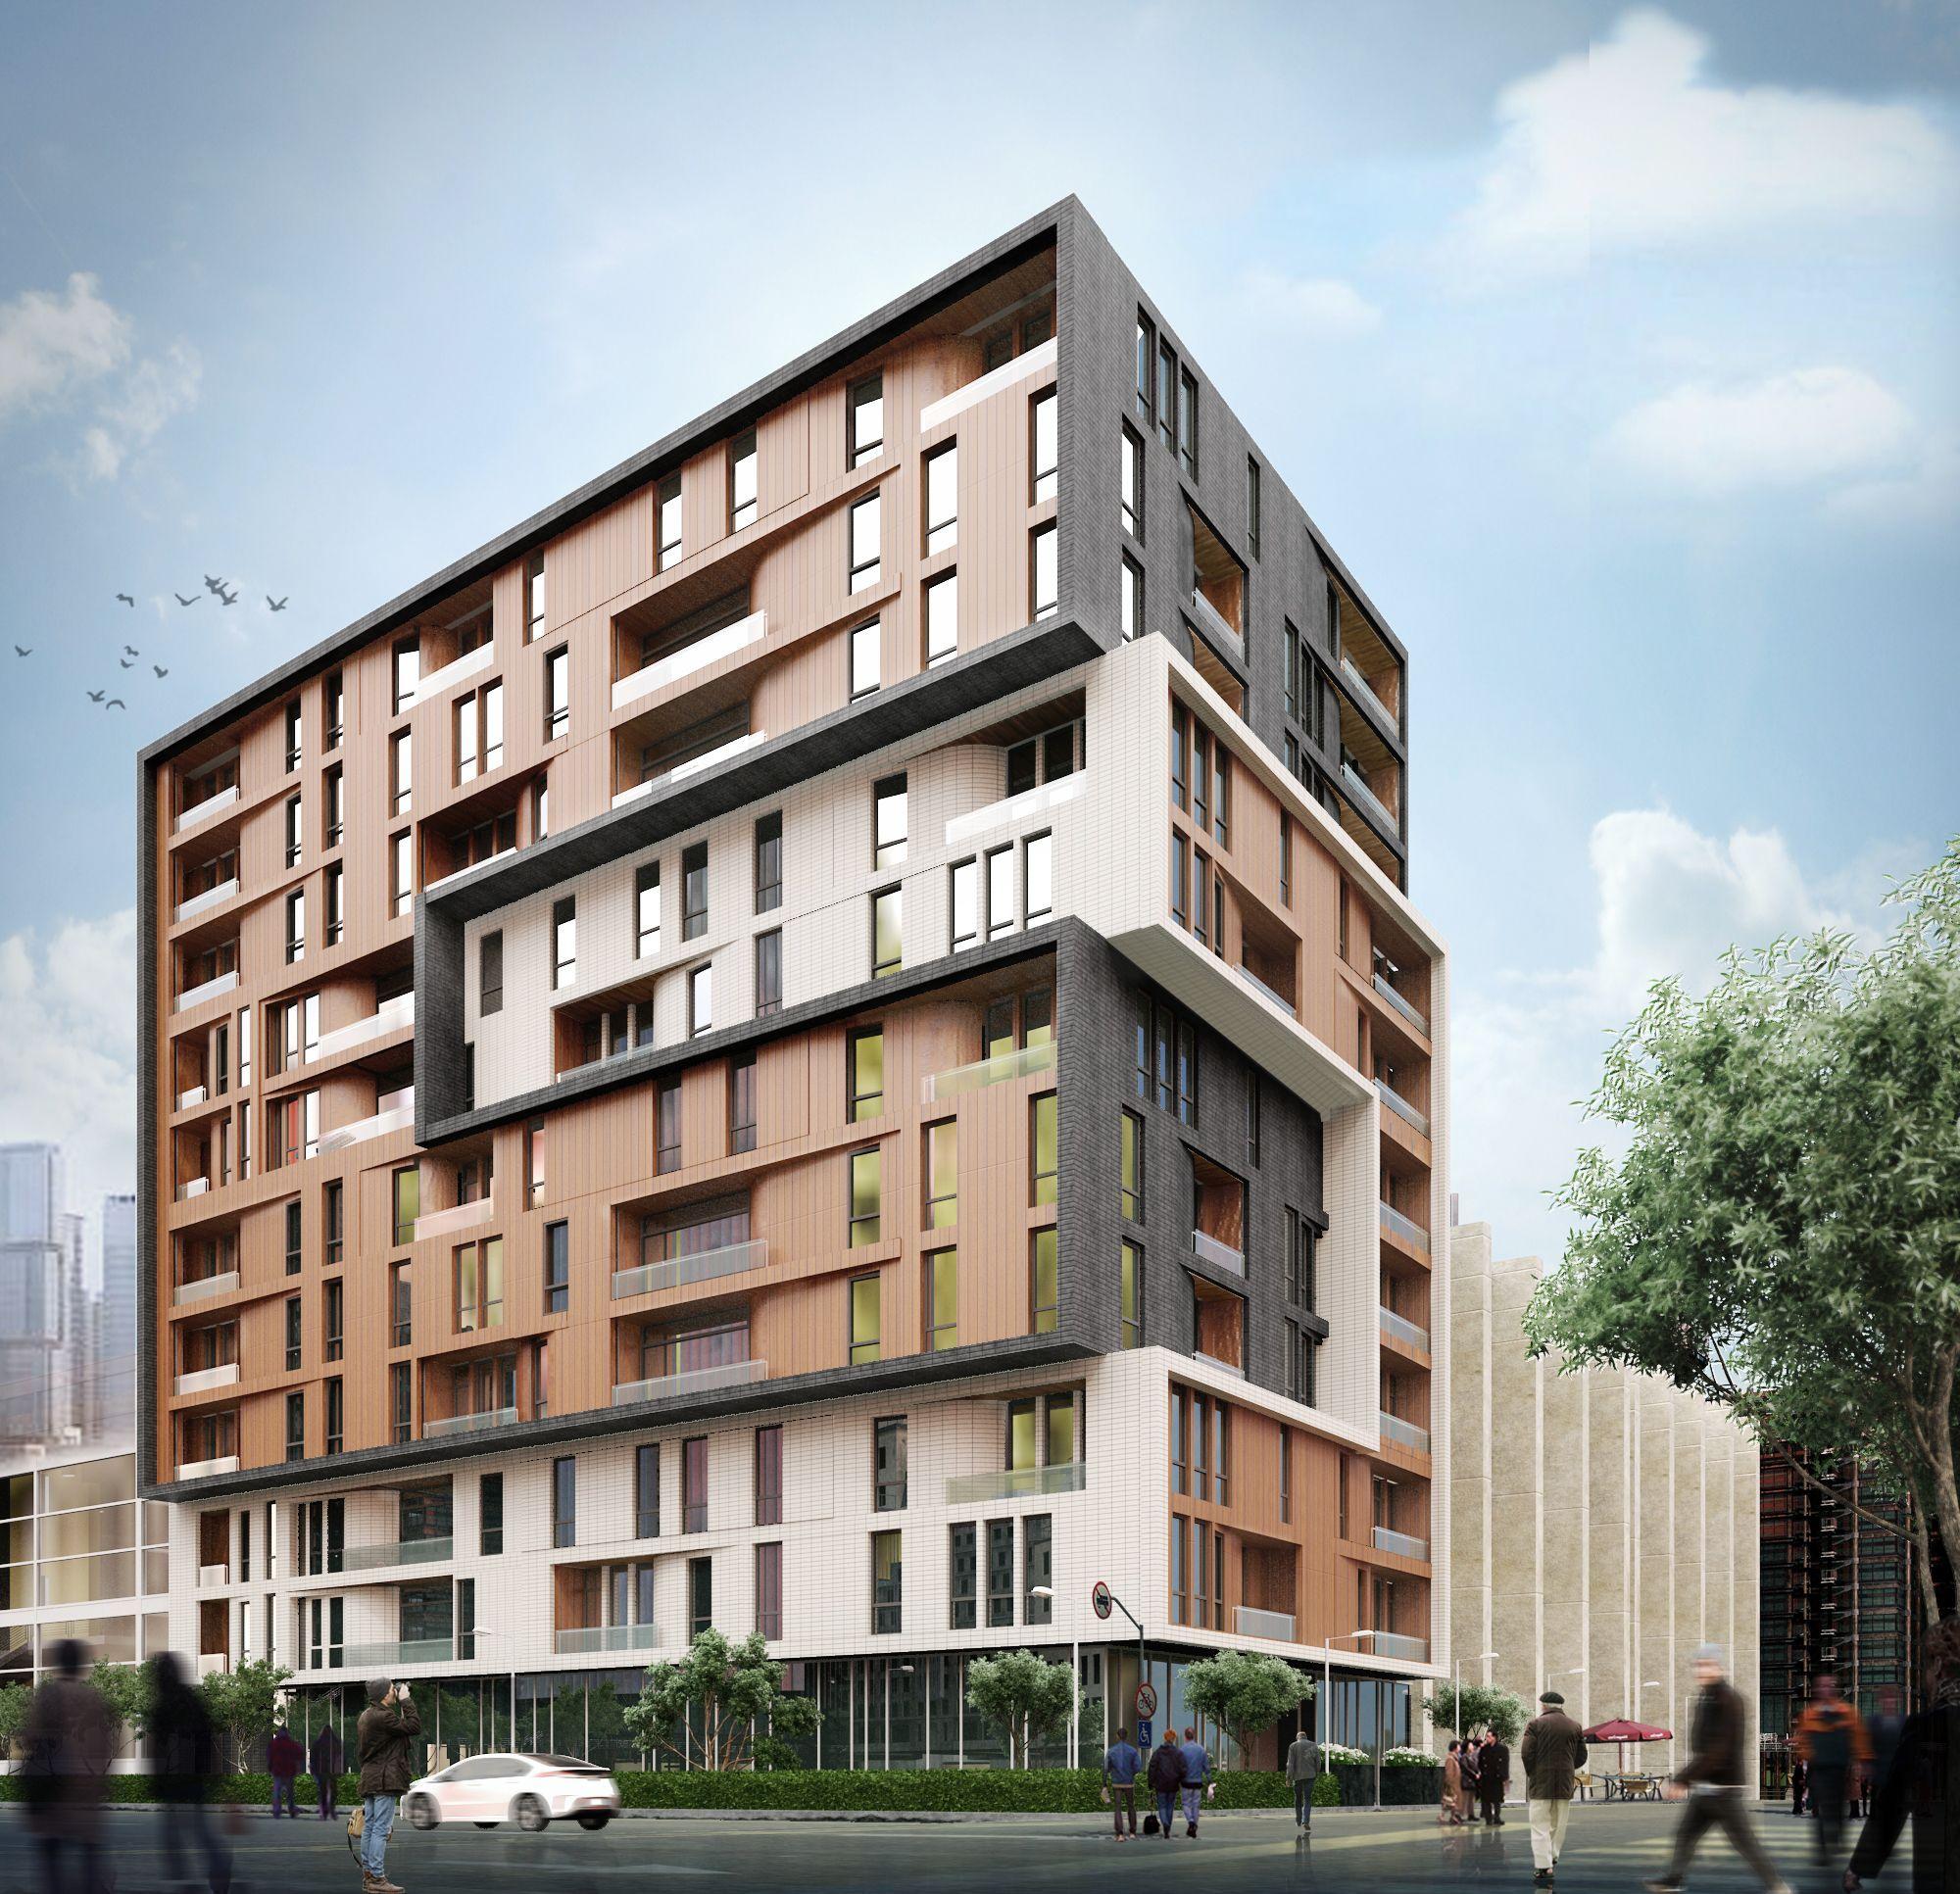 Pin von A+Y Architects (D|F design) auf INSPIRATION IDEA -- Public ...